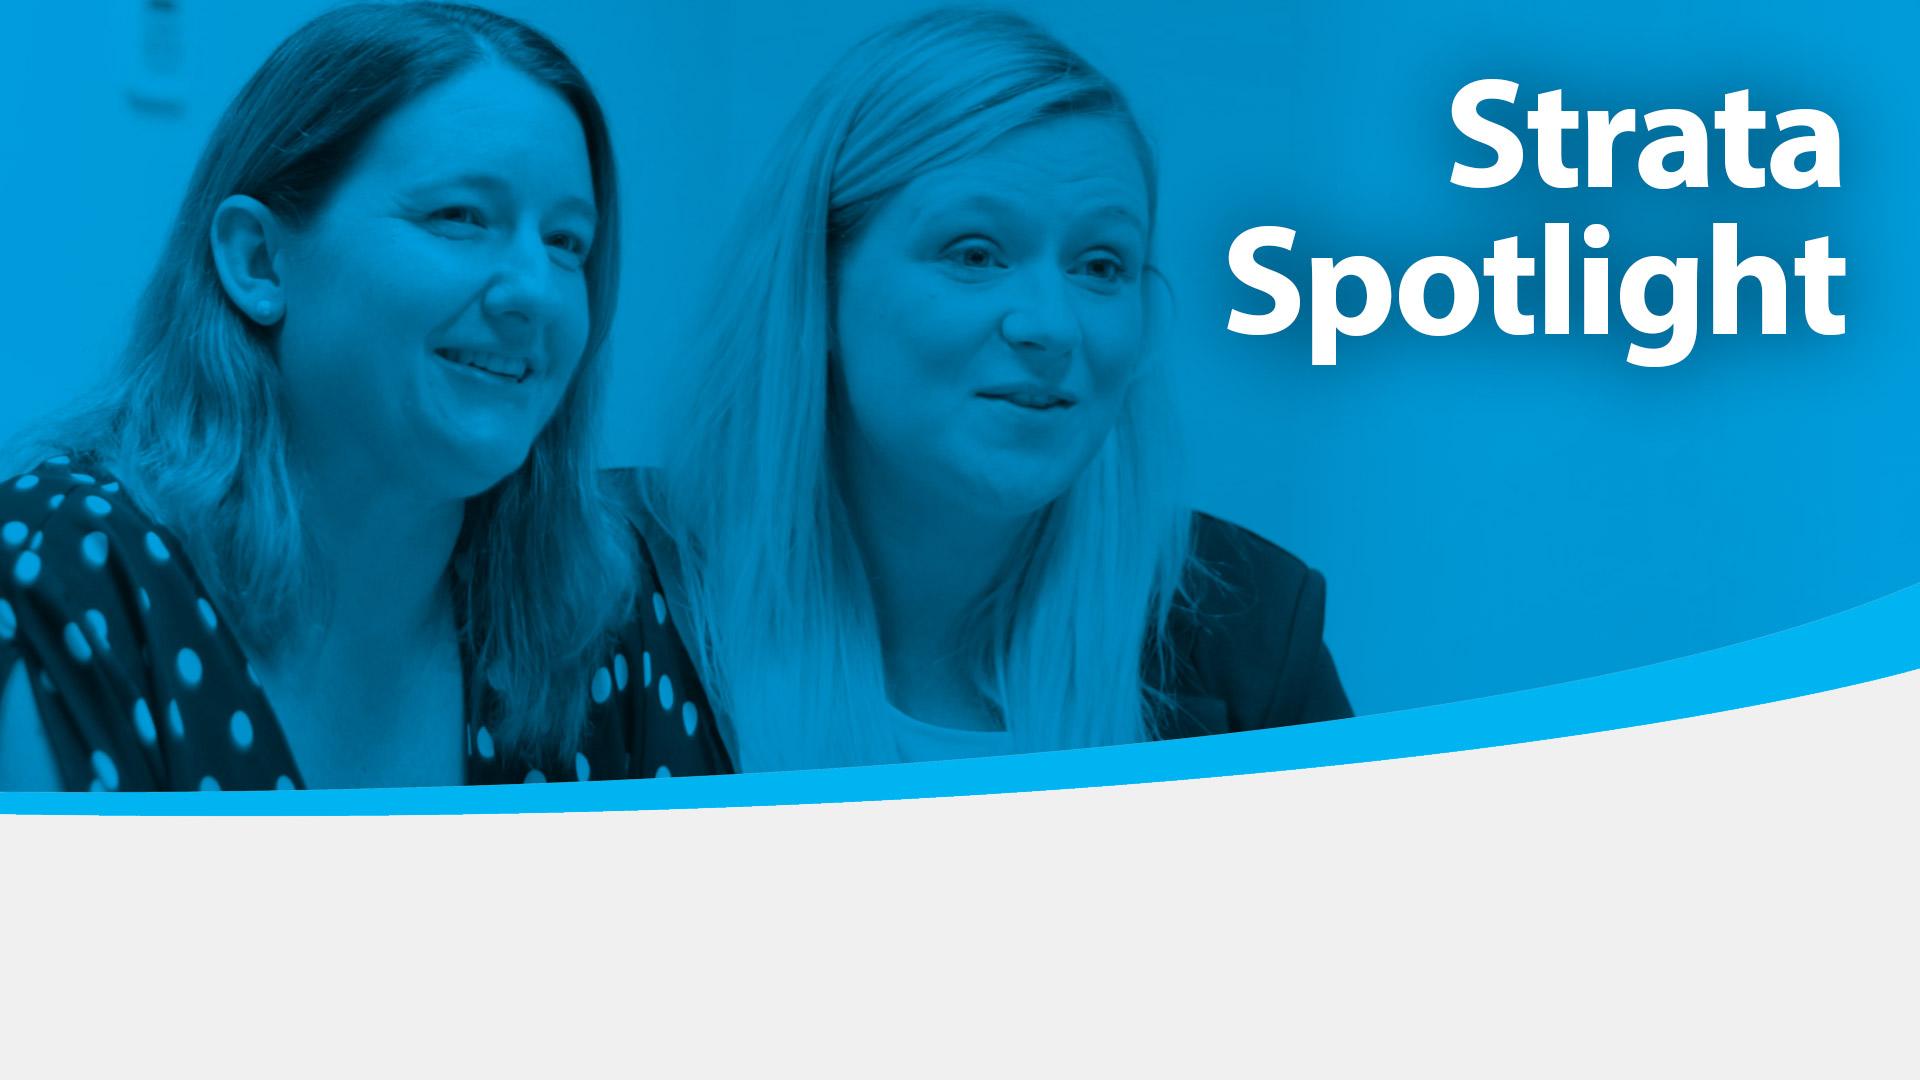 Strata Spotlight - All Strata Jill Walshaw & Kylie Williams